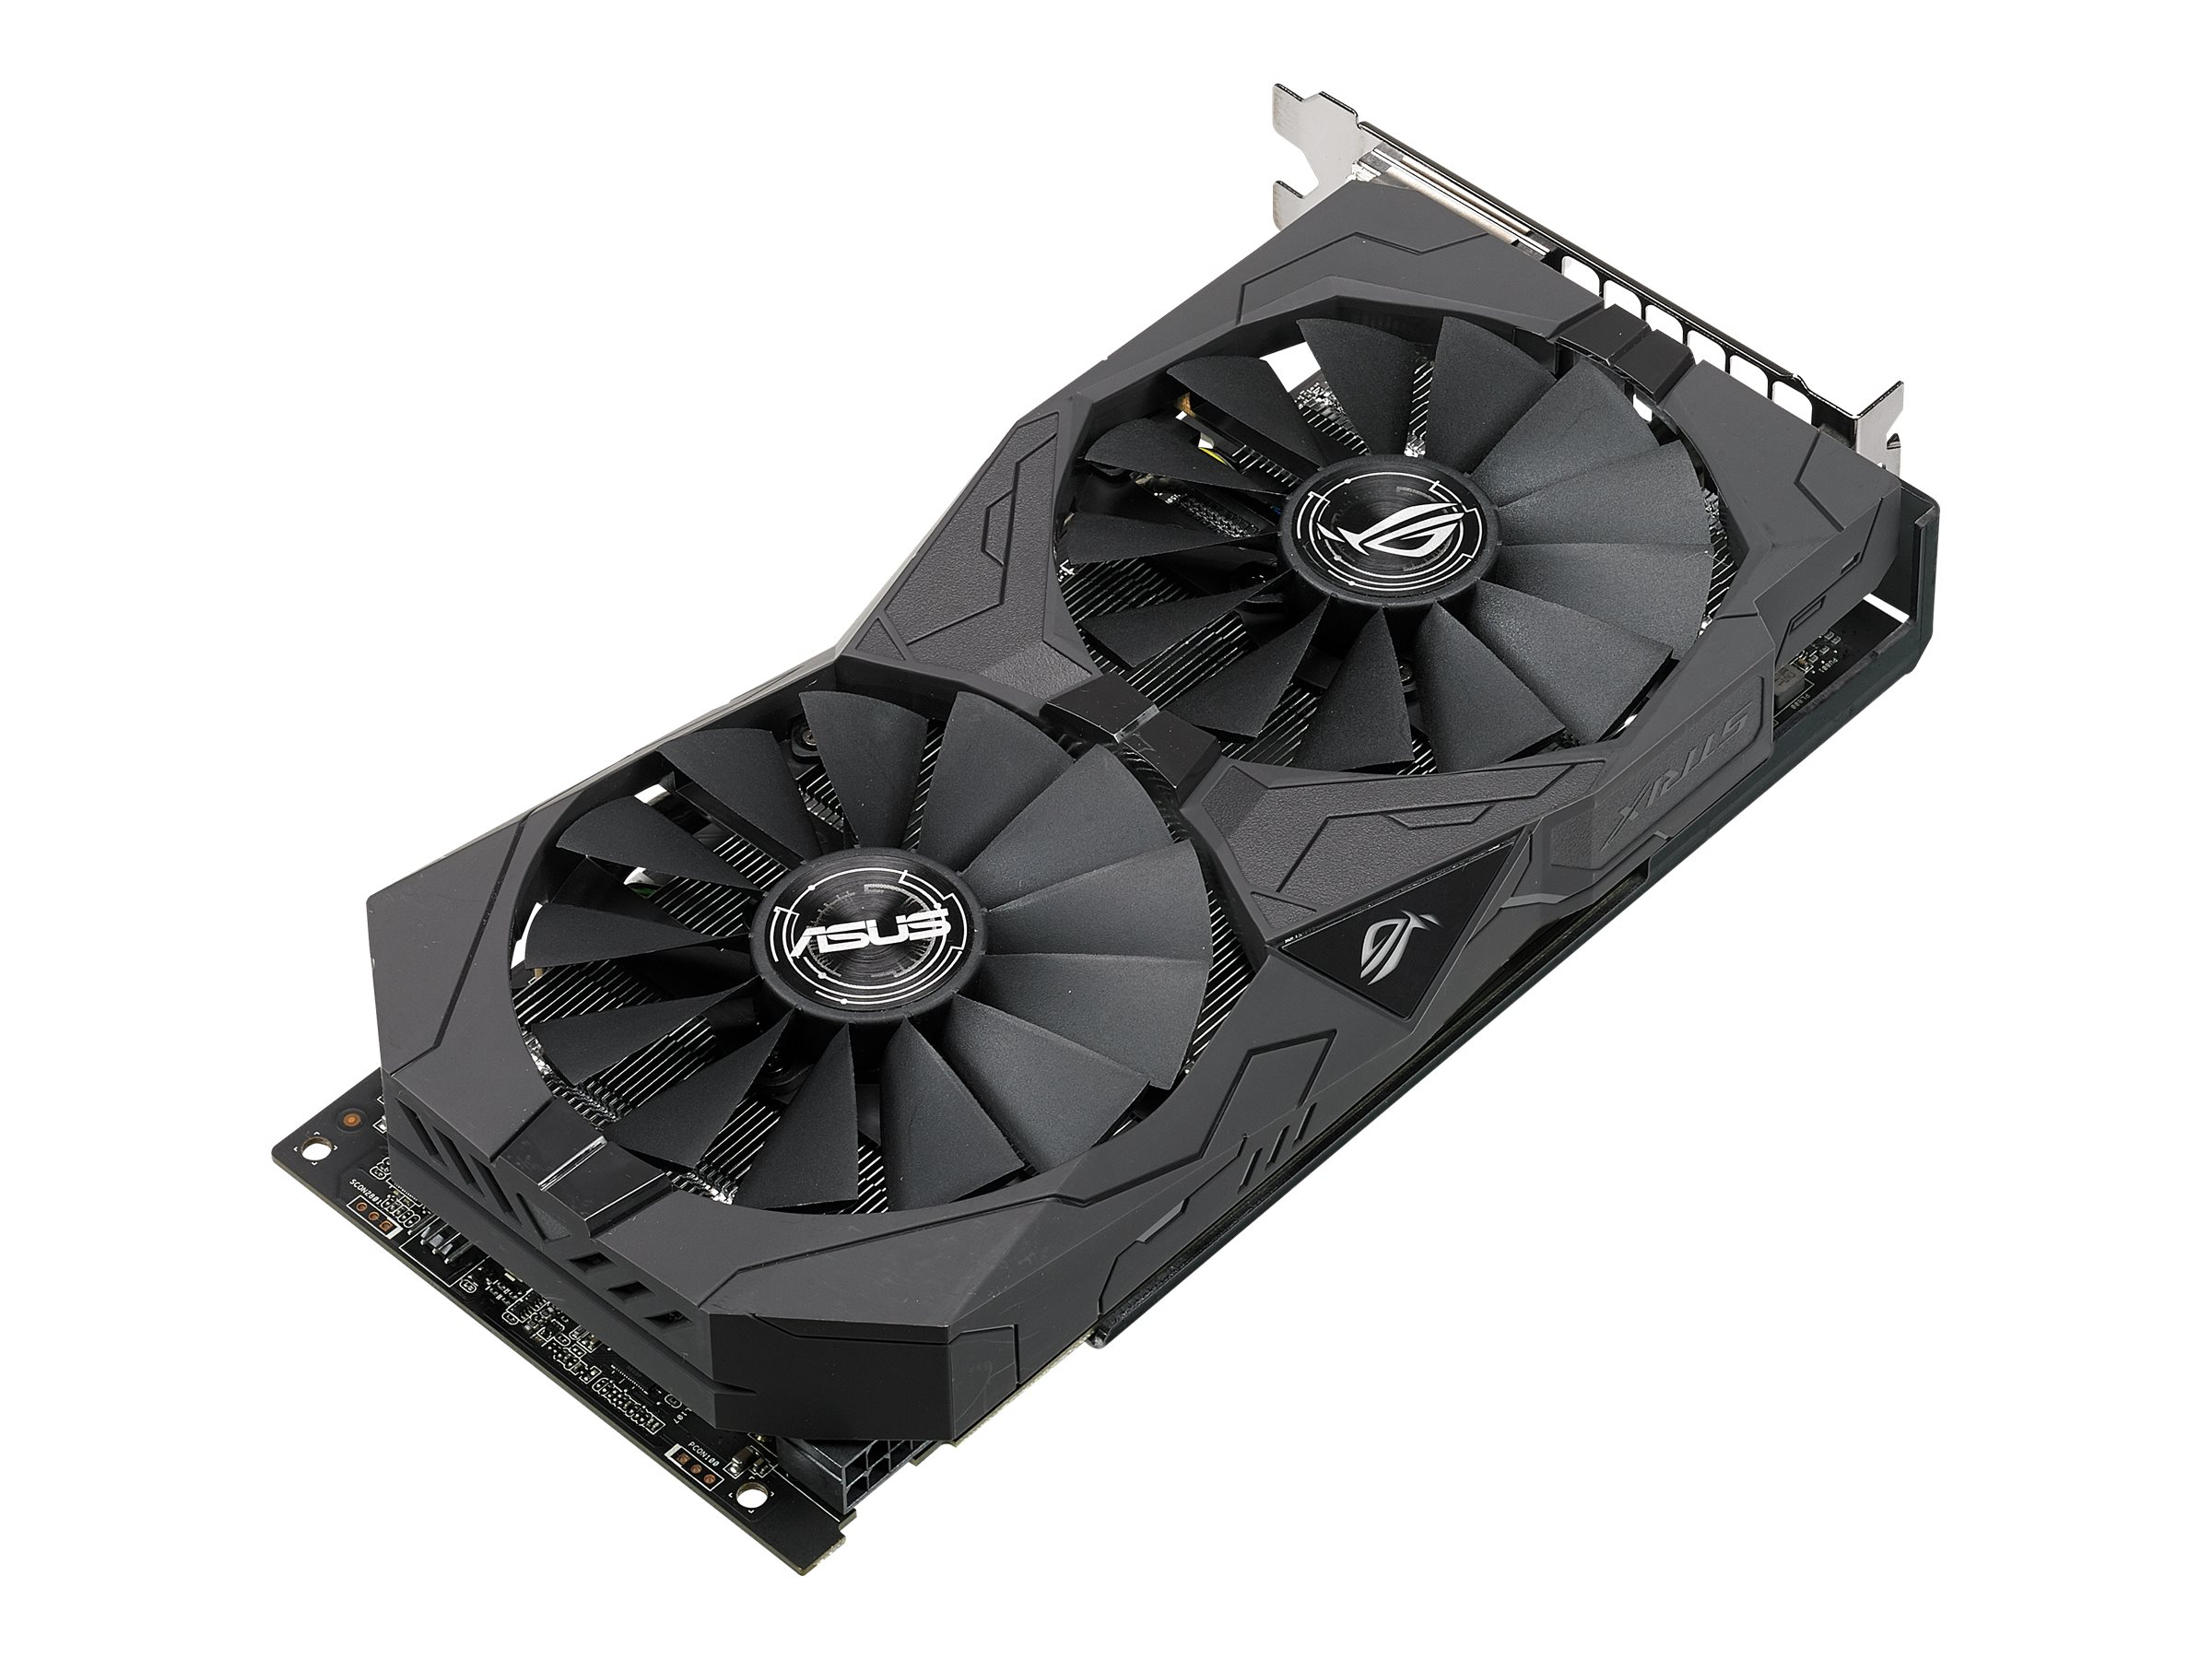 Asus AMD Radeon RX 570 PCIe Overclocked Graphics Card, 4GB GDDR5